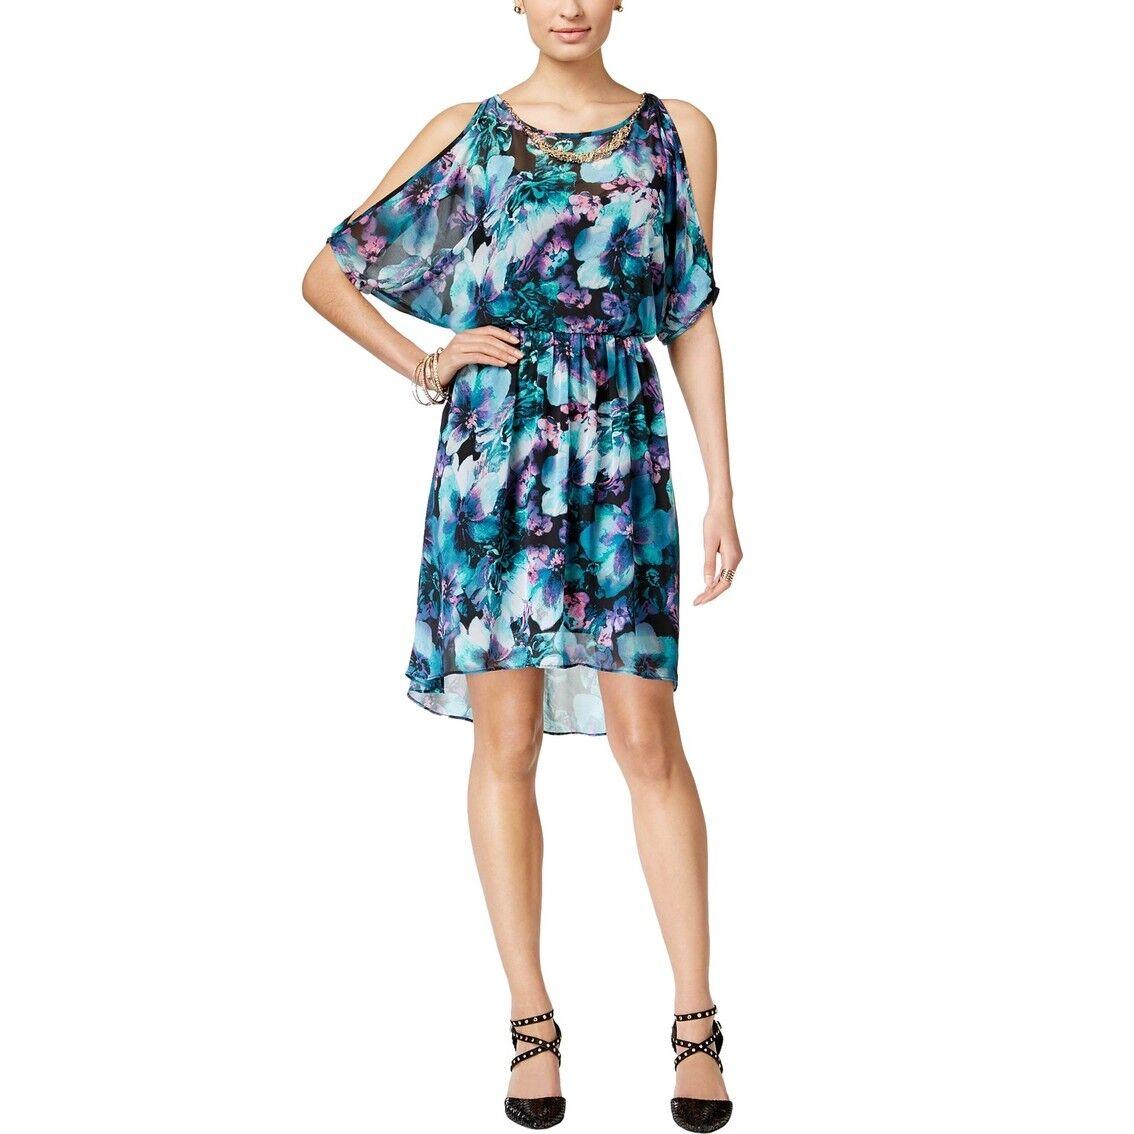 NEW  Thalia Sodi Cold Shoulder Floral Dress bluee Size L